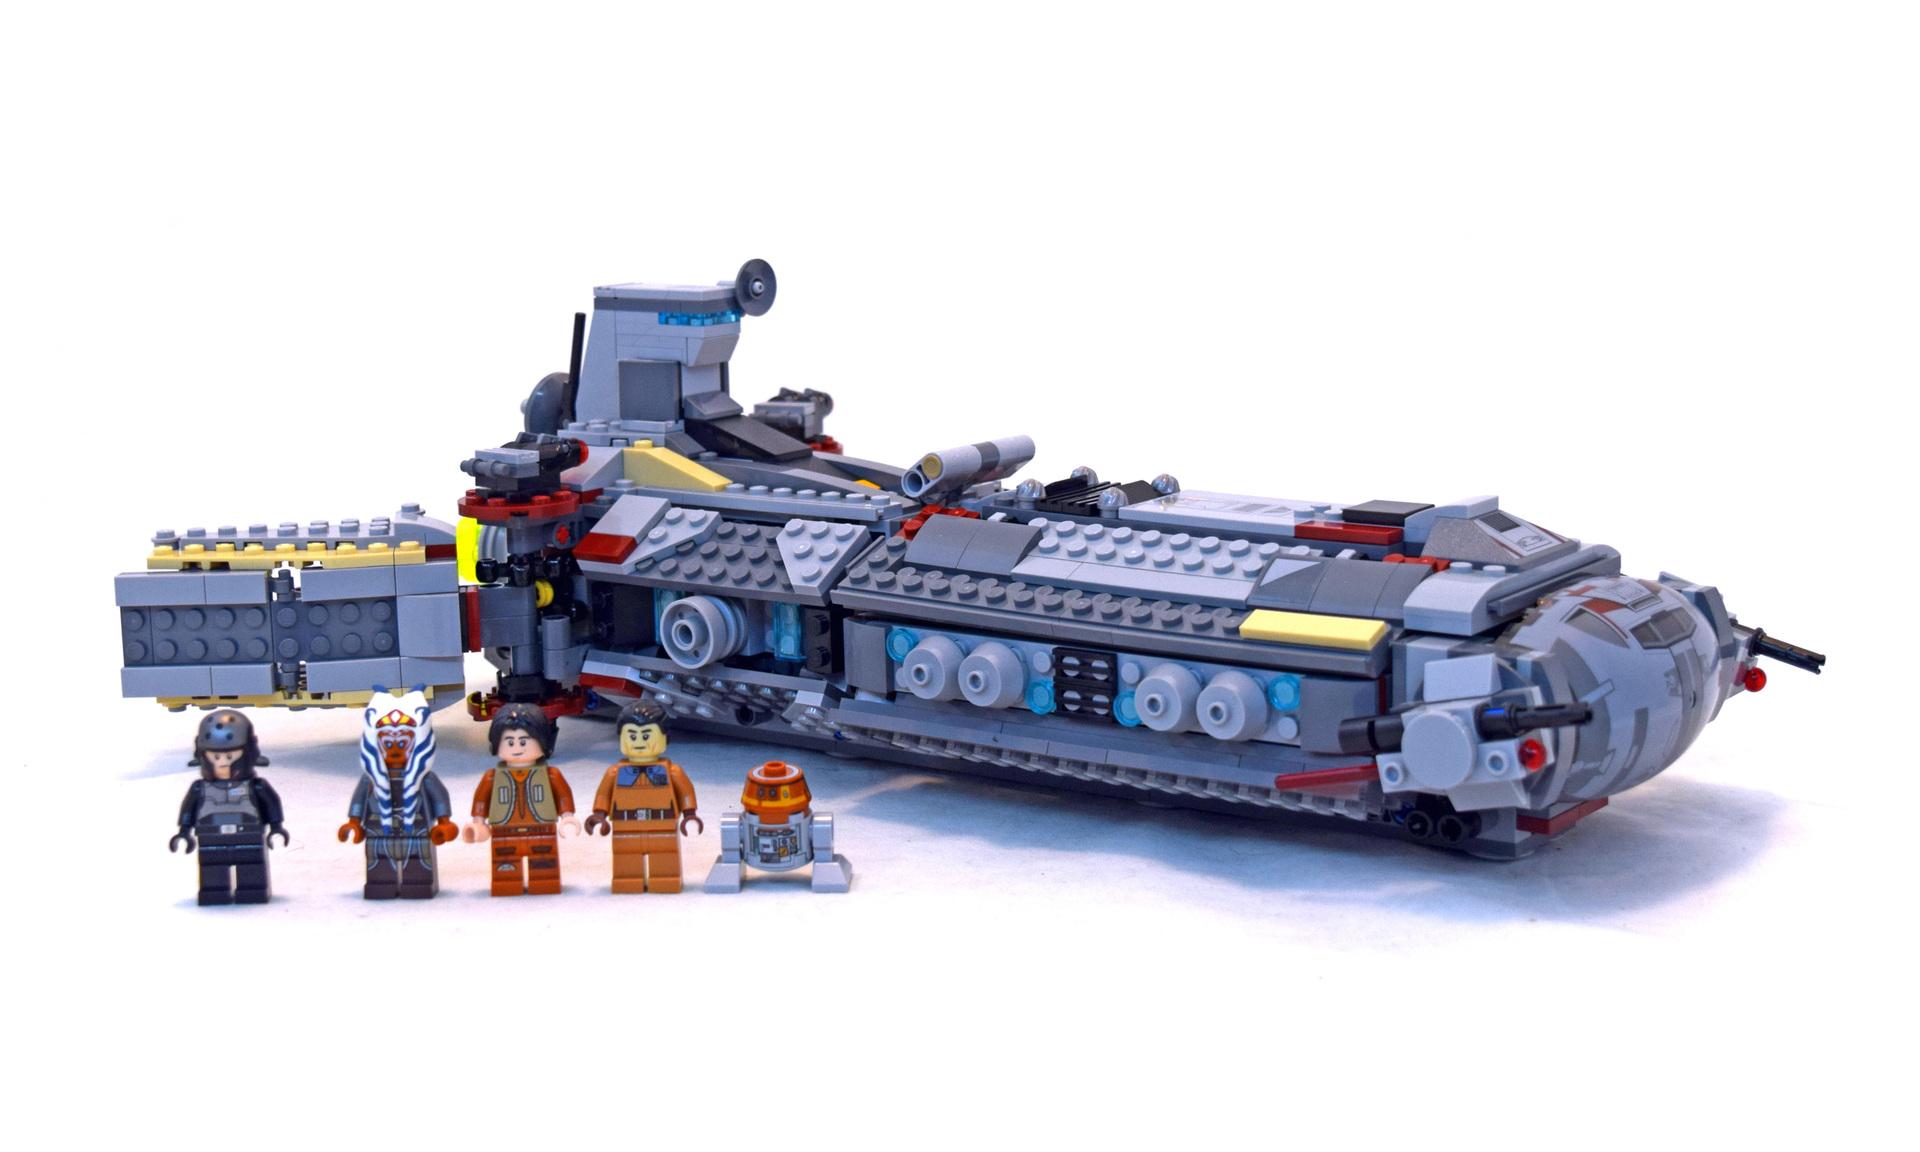 Lego 75158 Rebel Combat Frigate Set Parts Inventory And